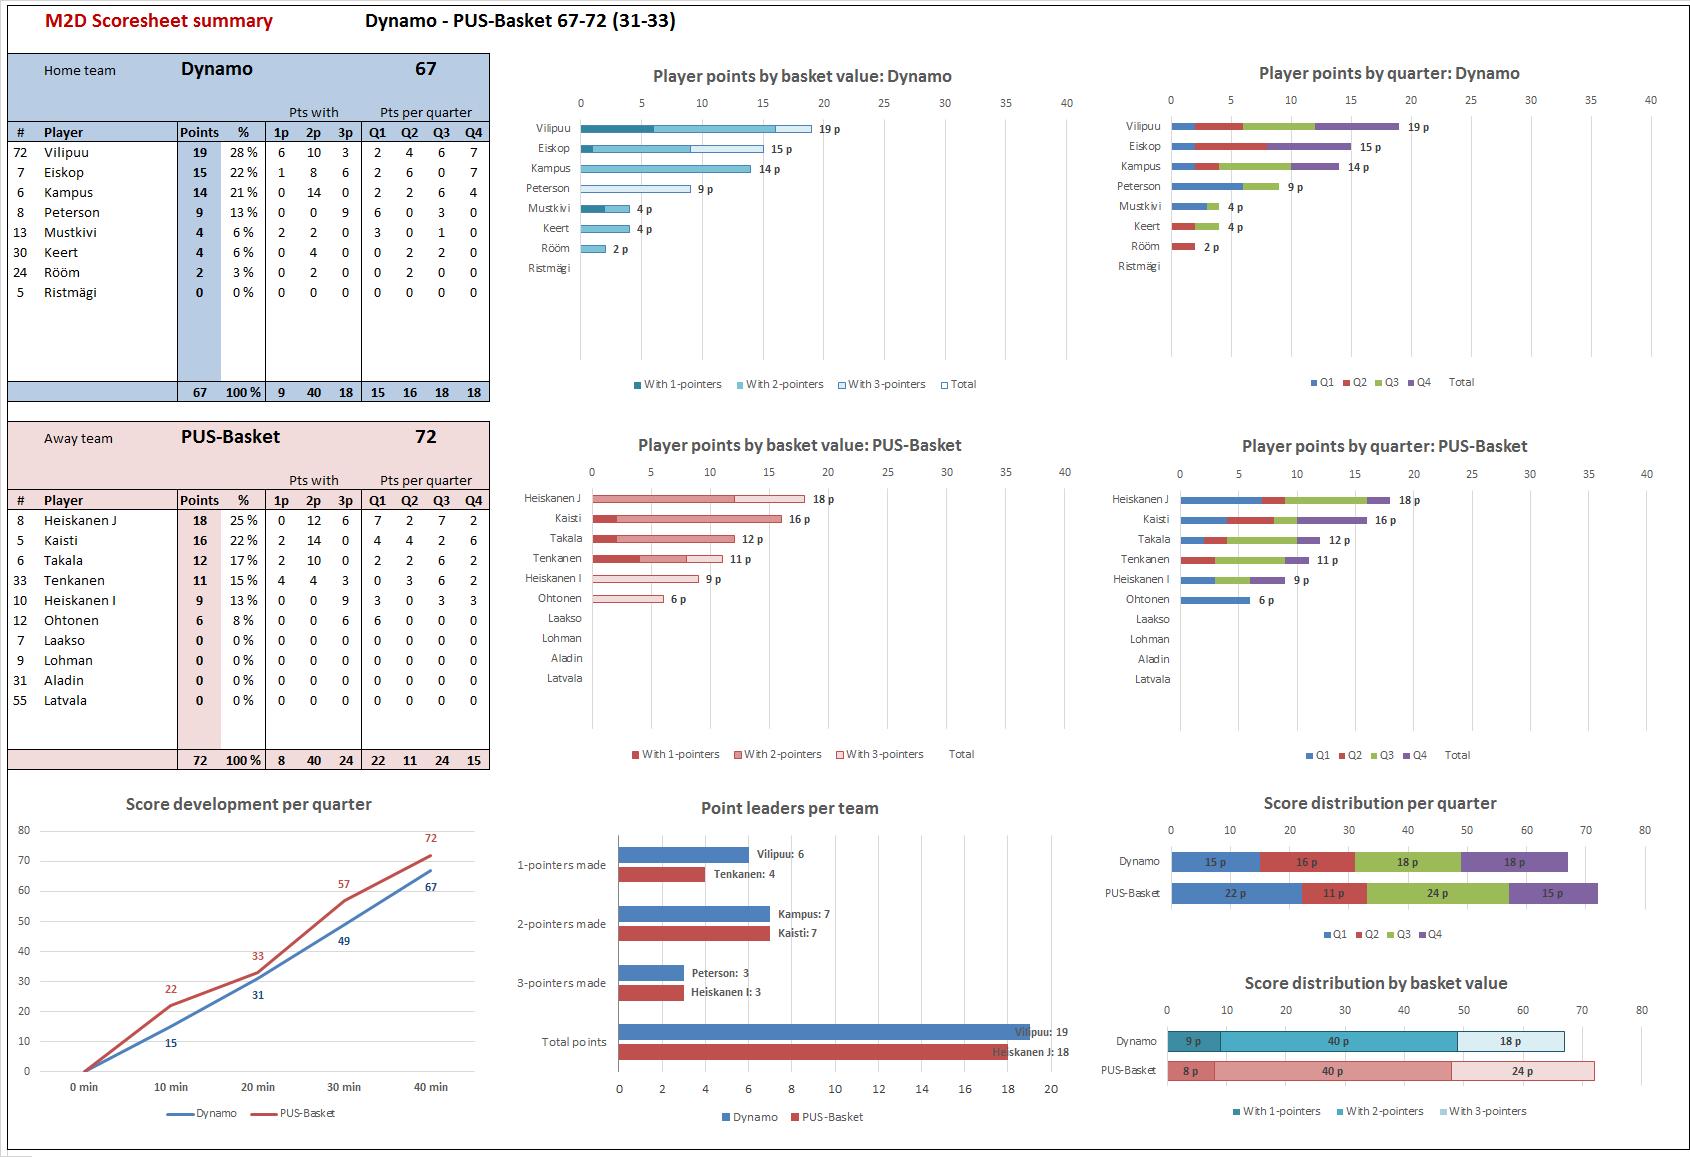 M2D_Scoresheet_2015-11-28_Dynamo-PUS